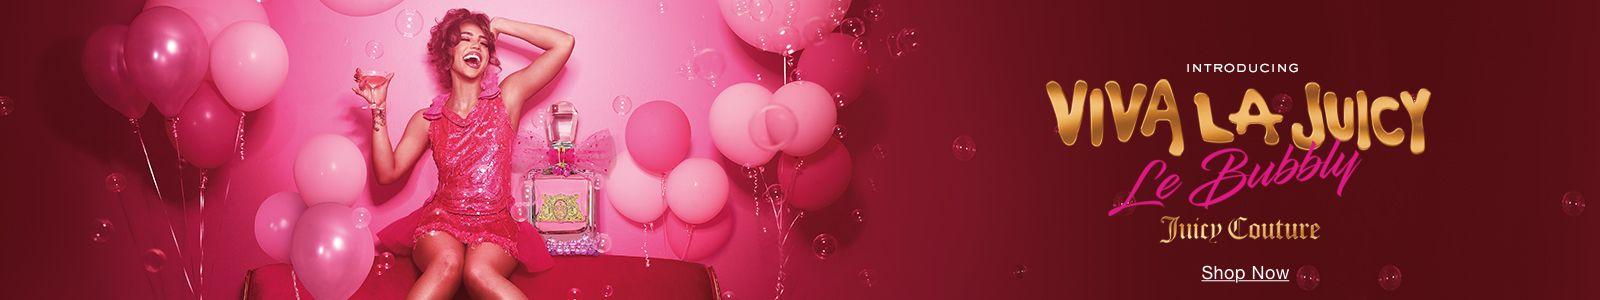 Introducing Viva La Juice Le Bubbly, Juice Couture